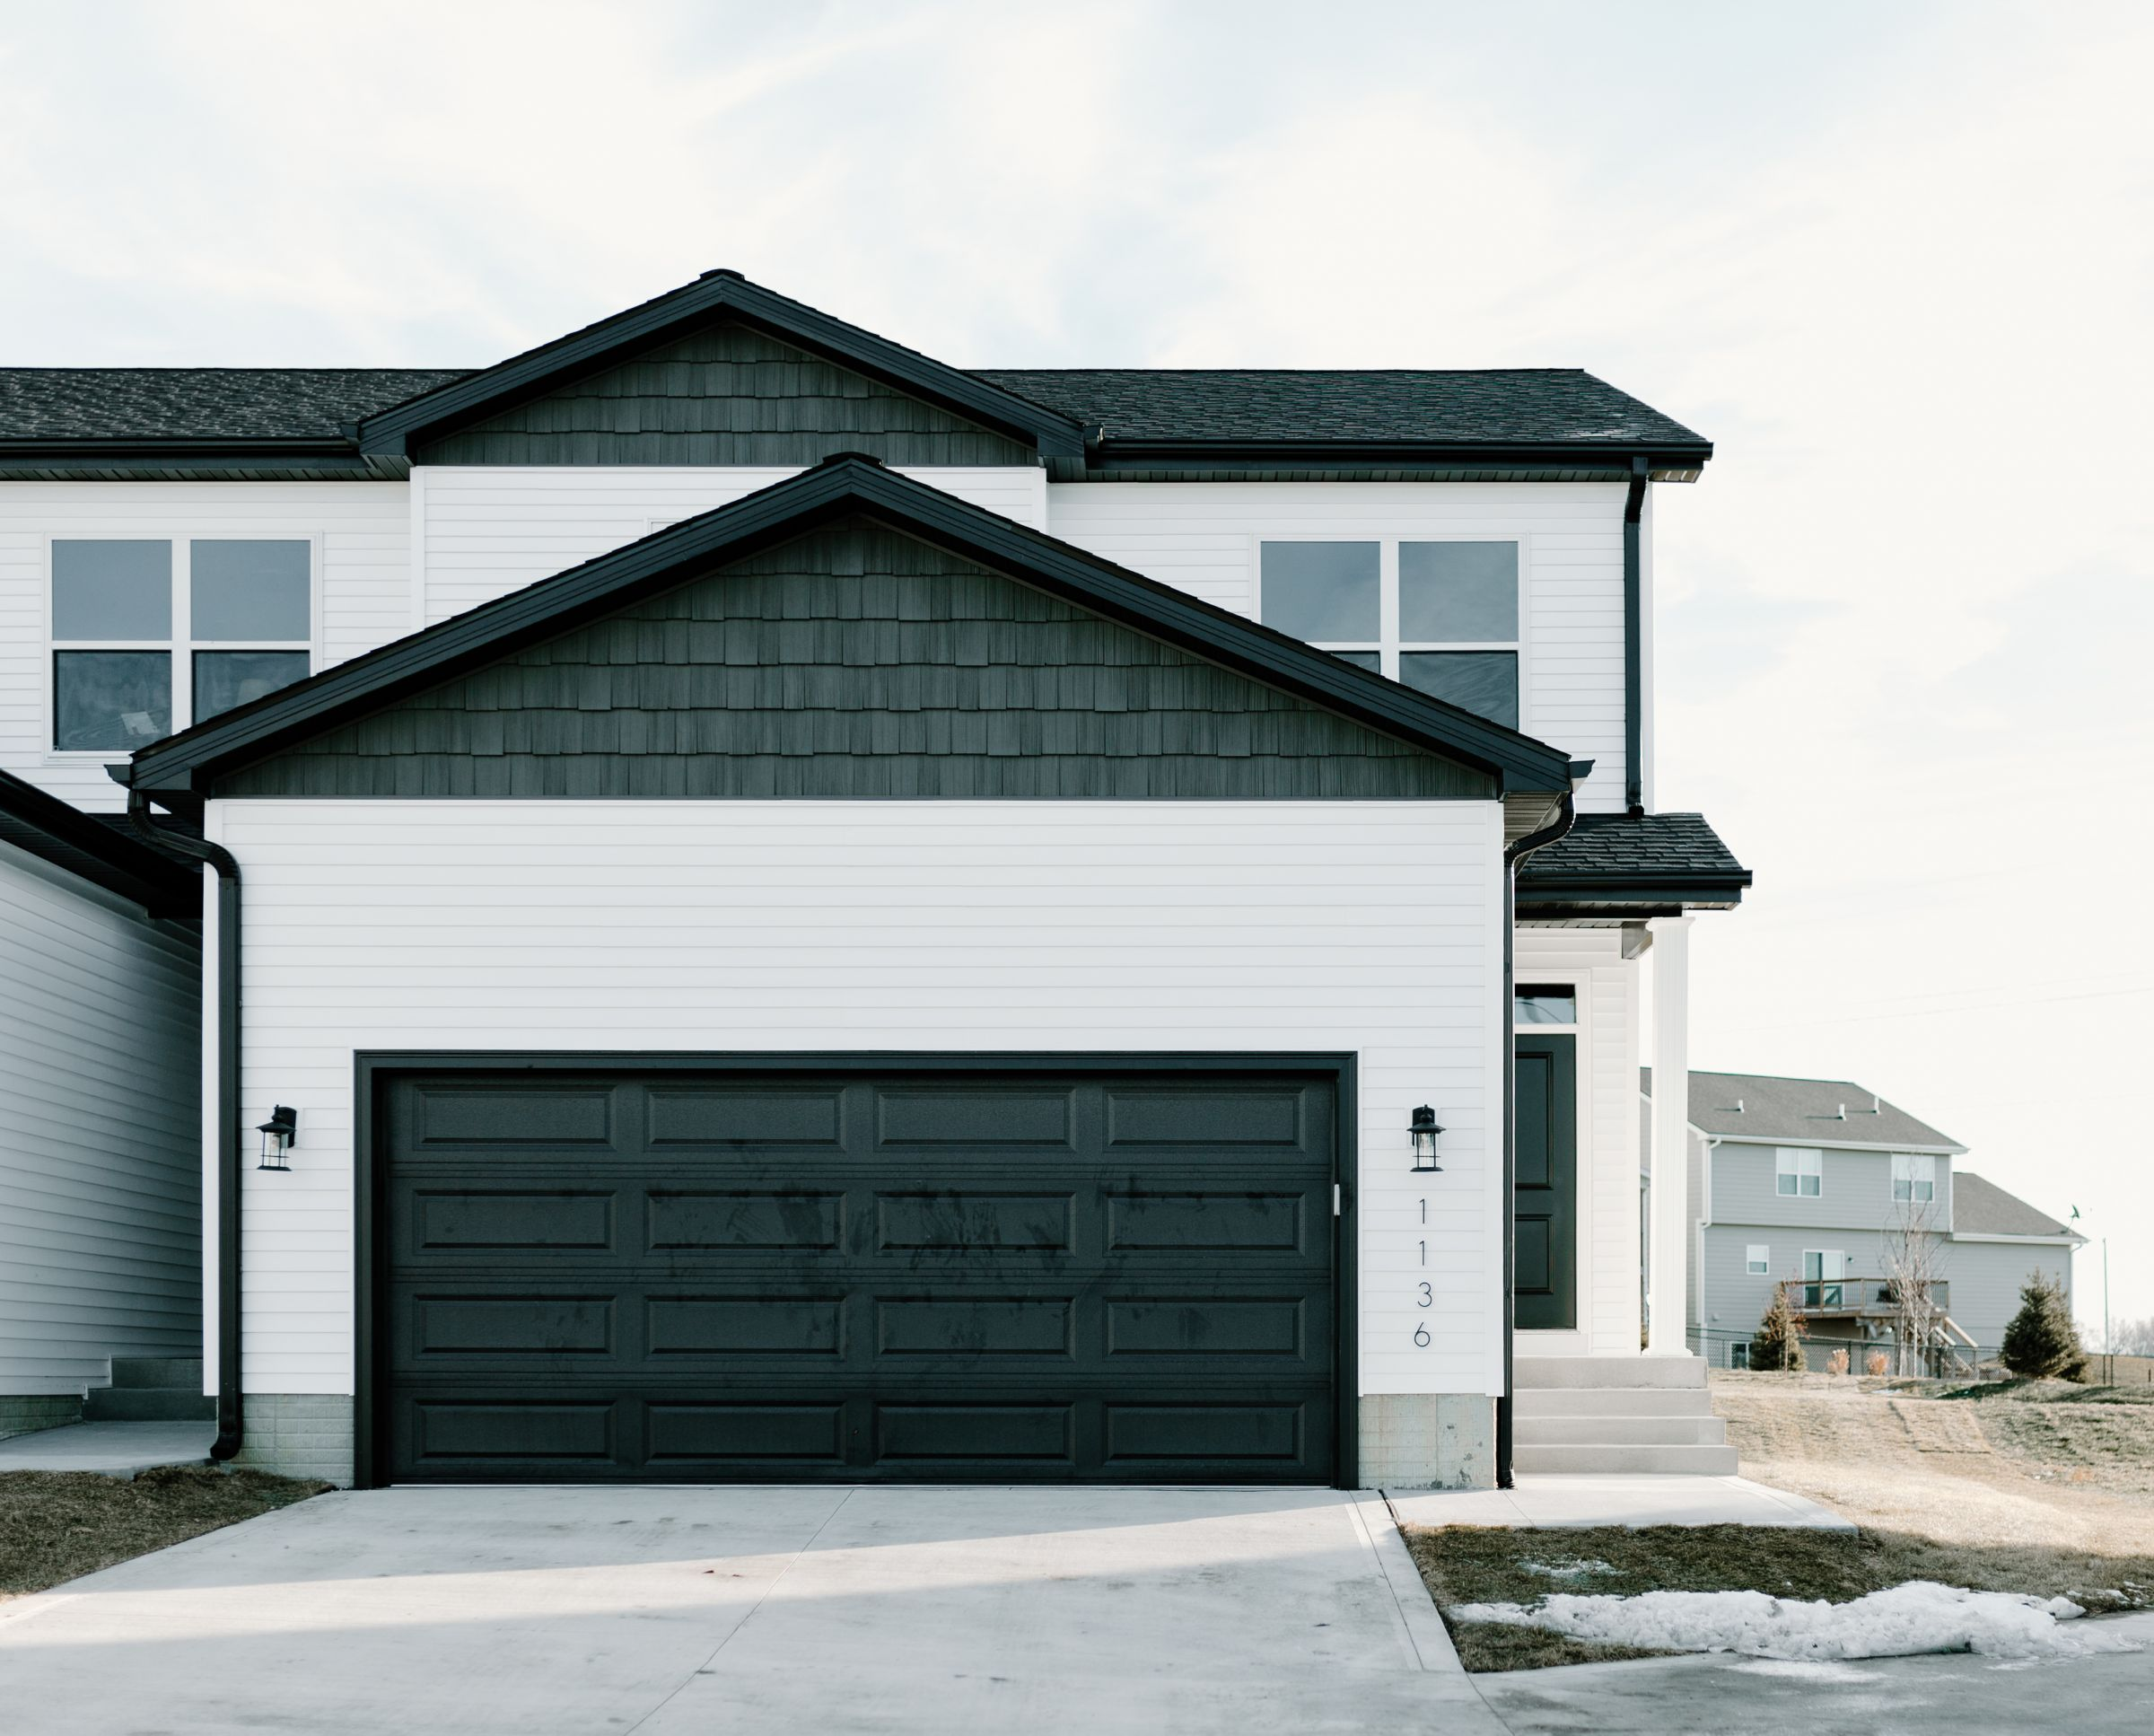 residential-warren-county-iowa-0-acres-listing-number-15367-0-2021-02-18-210353.jpg